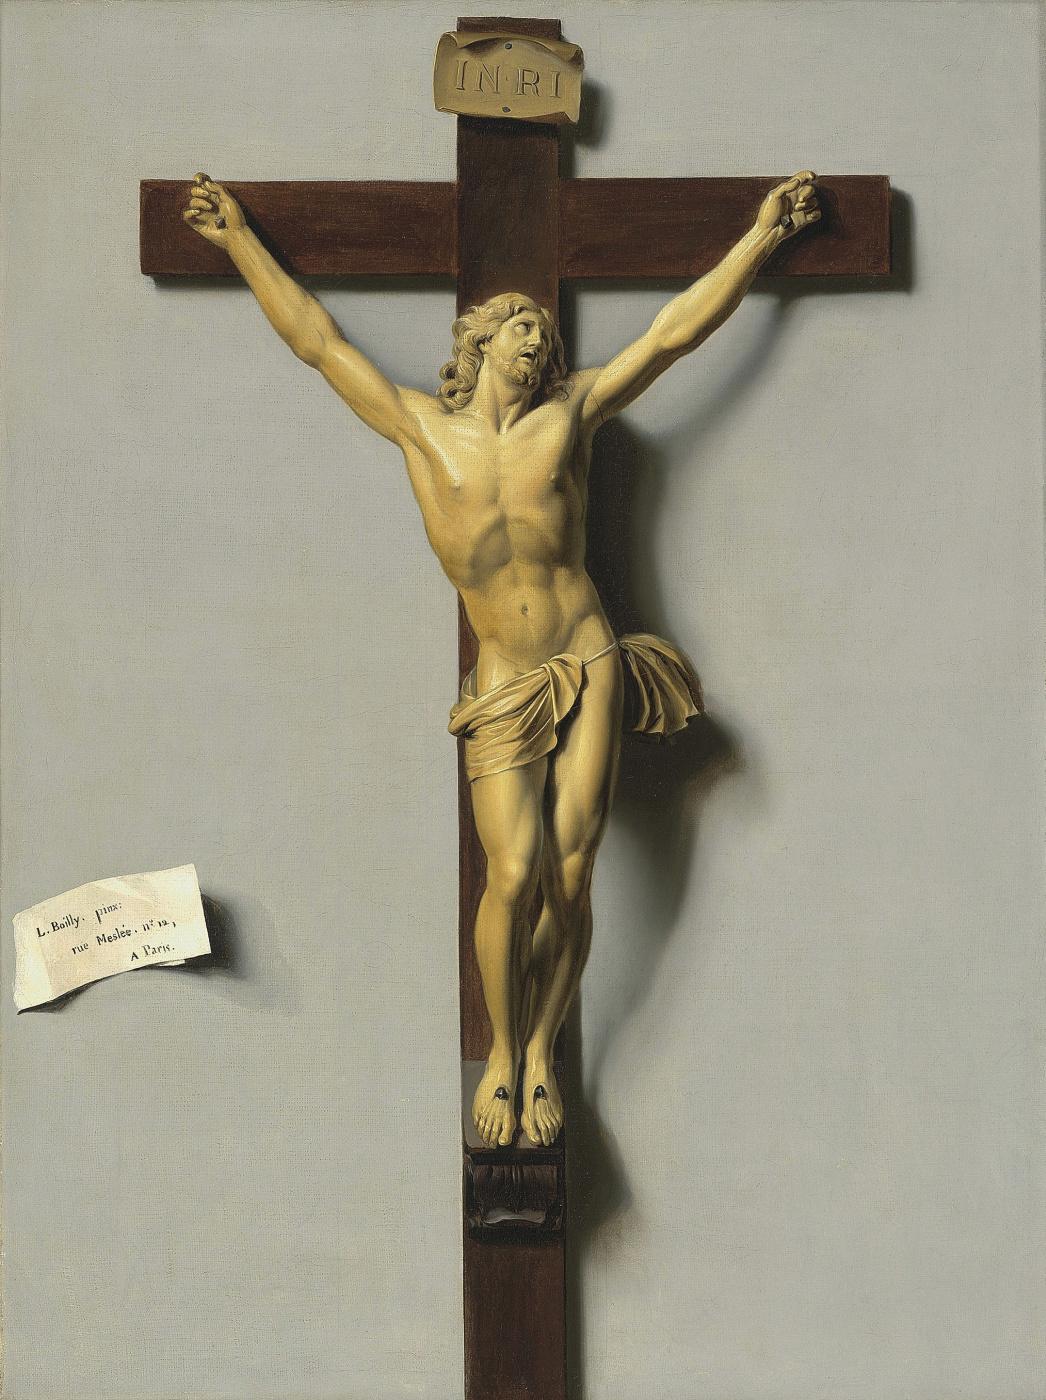 Louis-Leopold Boi. Trompe-l'oeil Crucifix of Ivory and Wood